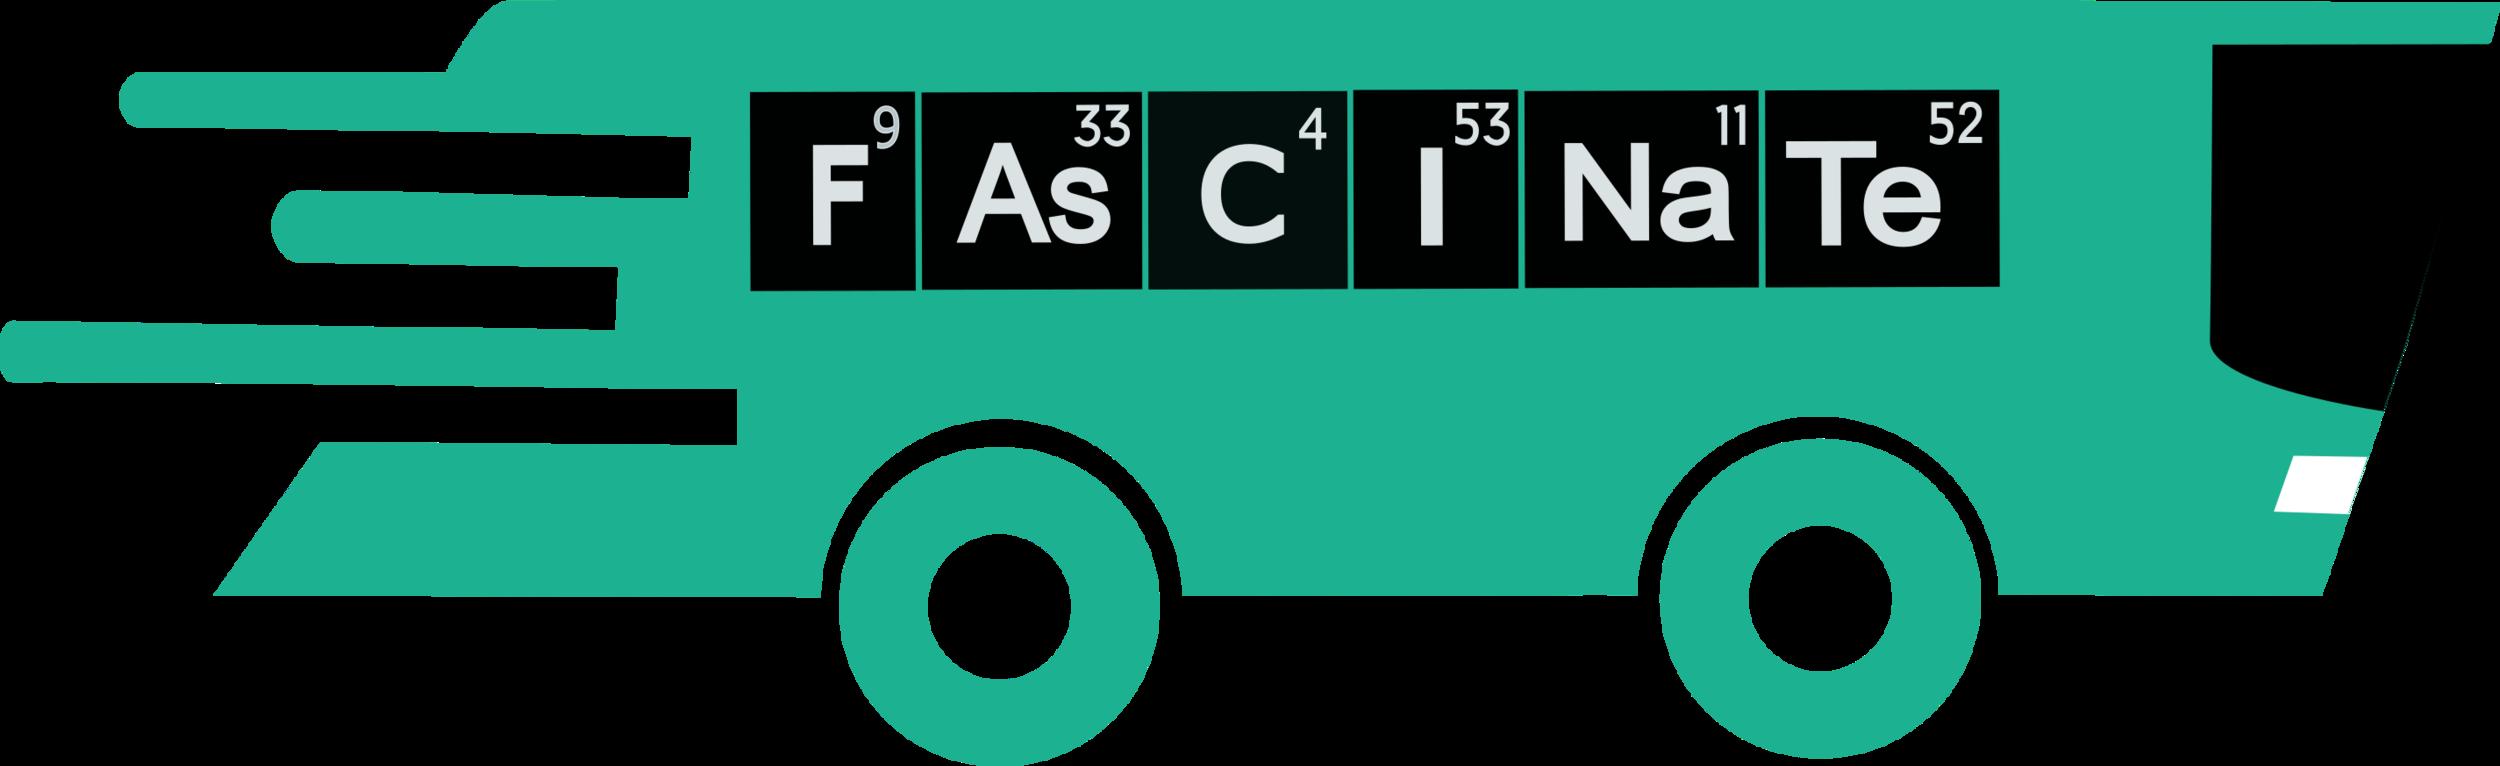 magic cool bus logo (1).png